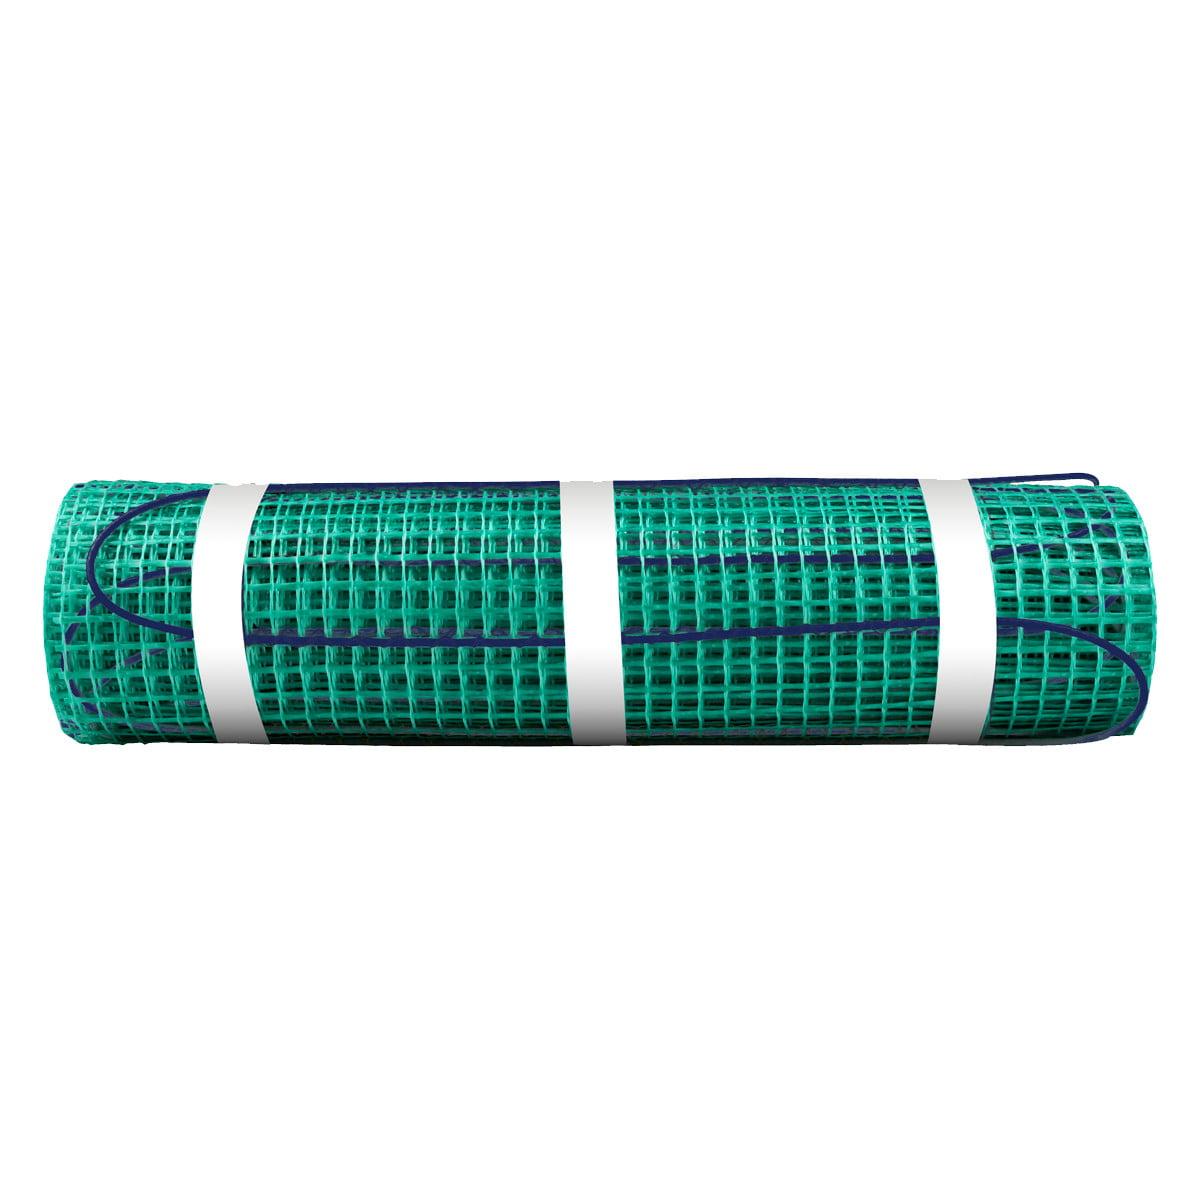 WarmlyYours TRT120-1.5x43 TempZone 120V 8.1A 1.5 Foot x 43 Foot Flex Roll